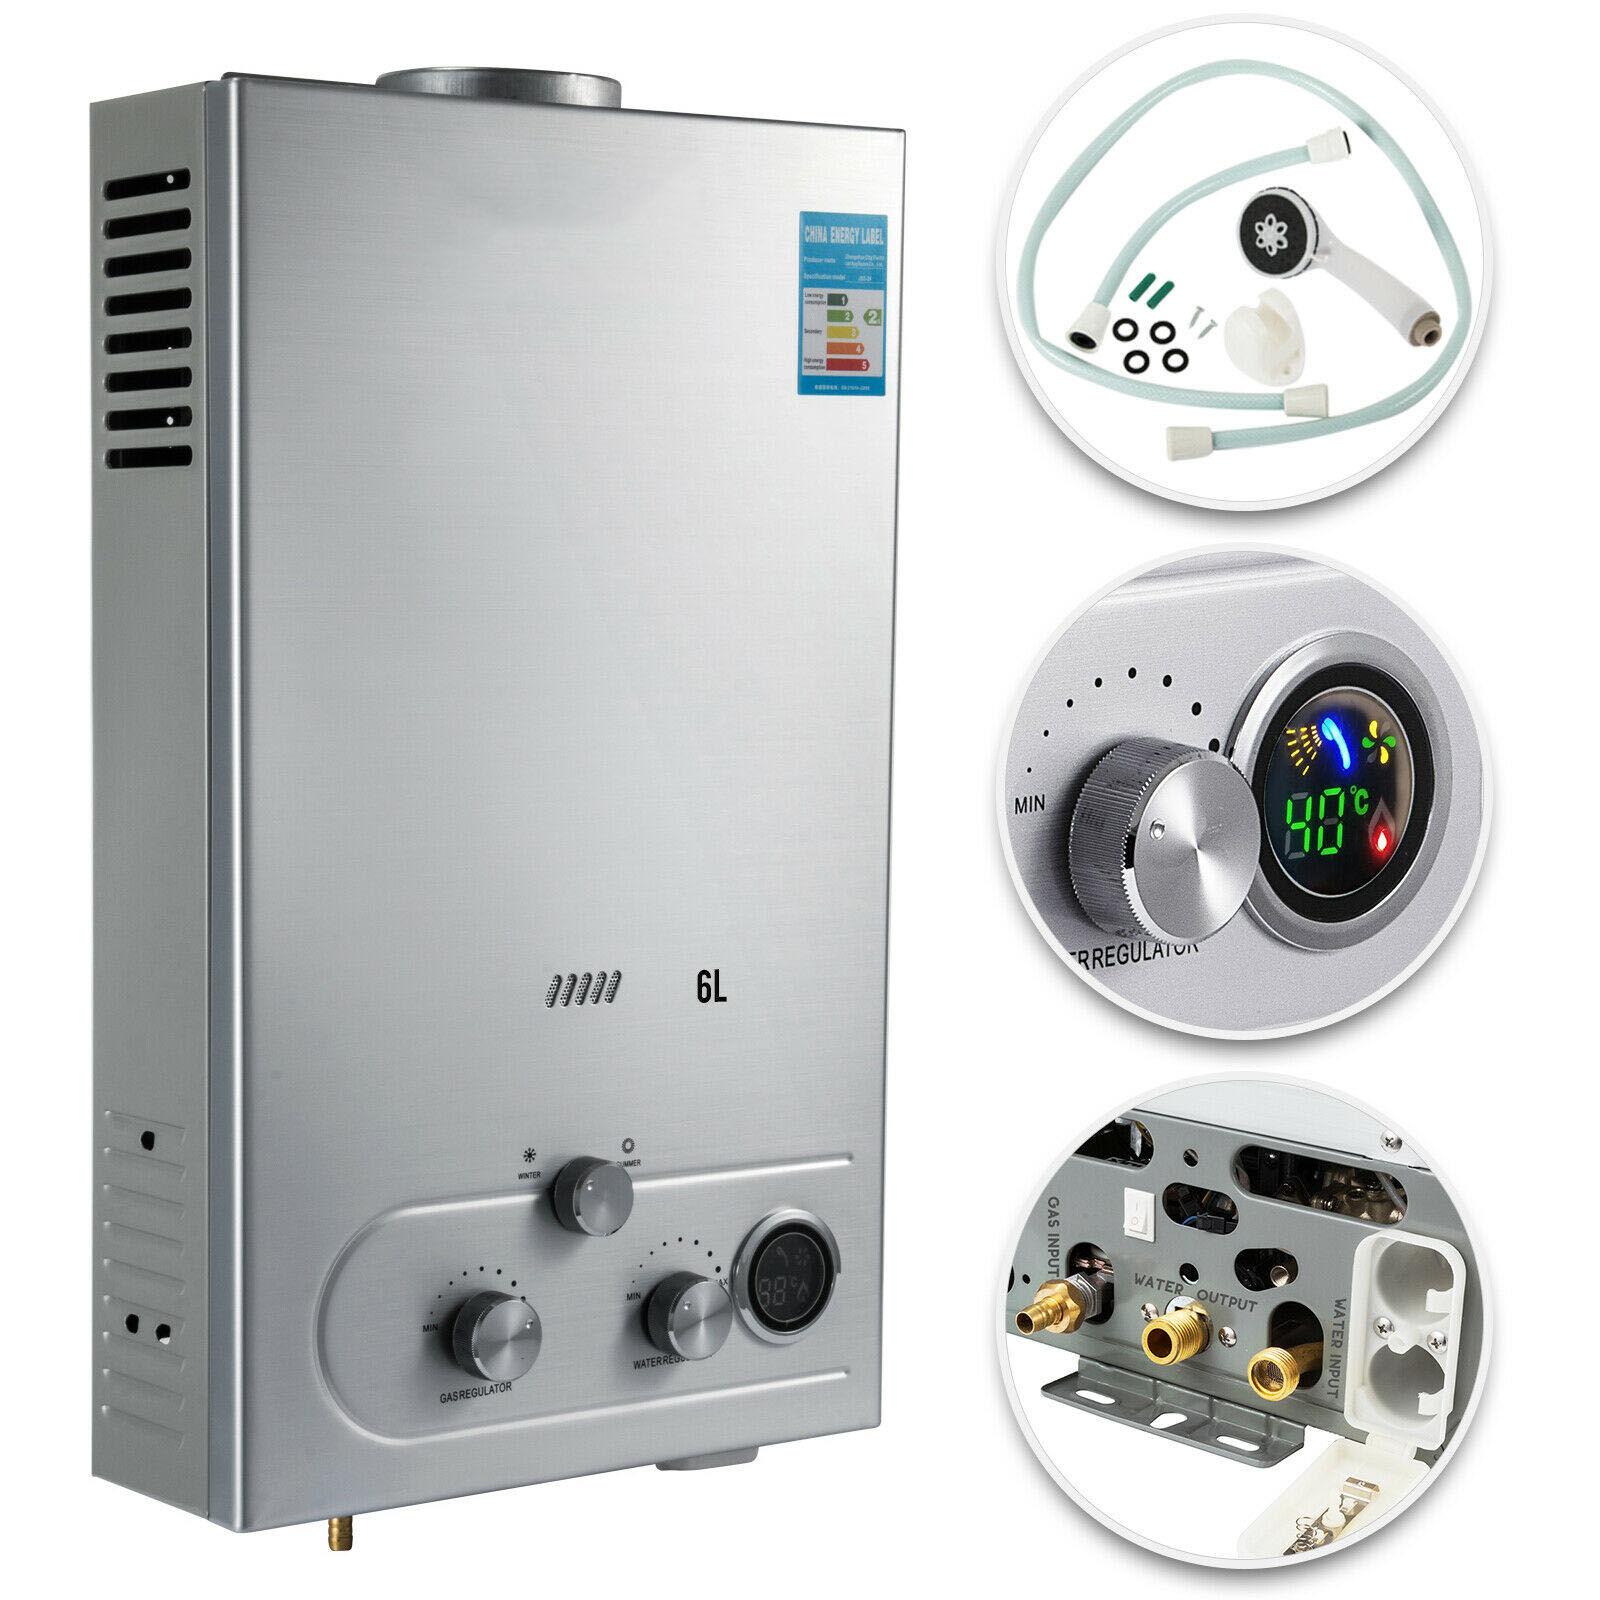 AliExpress Chauffe-eau au gaz propane 6L, chaudière à eau chaude